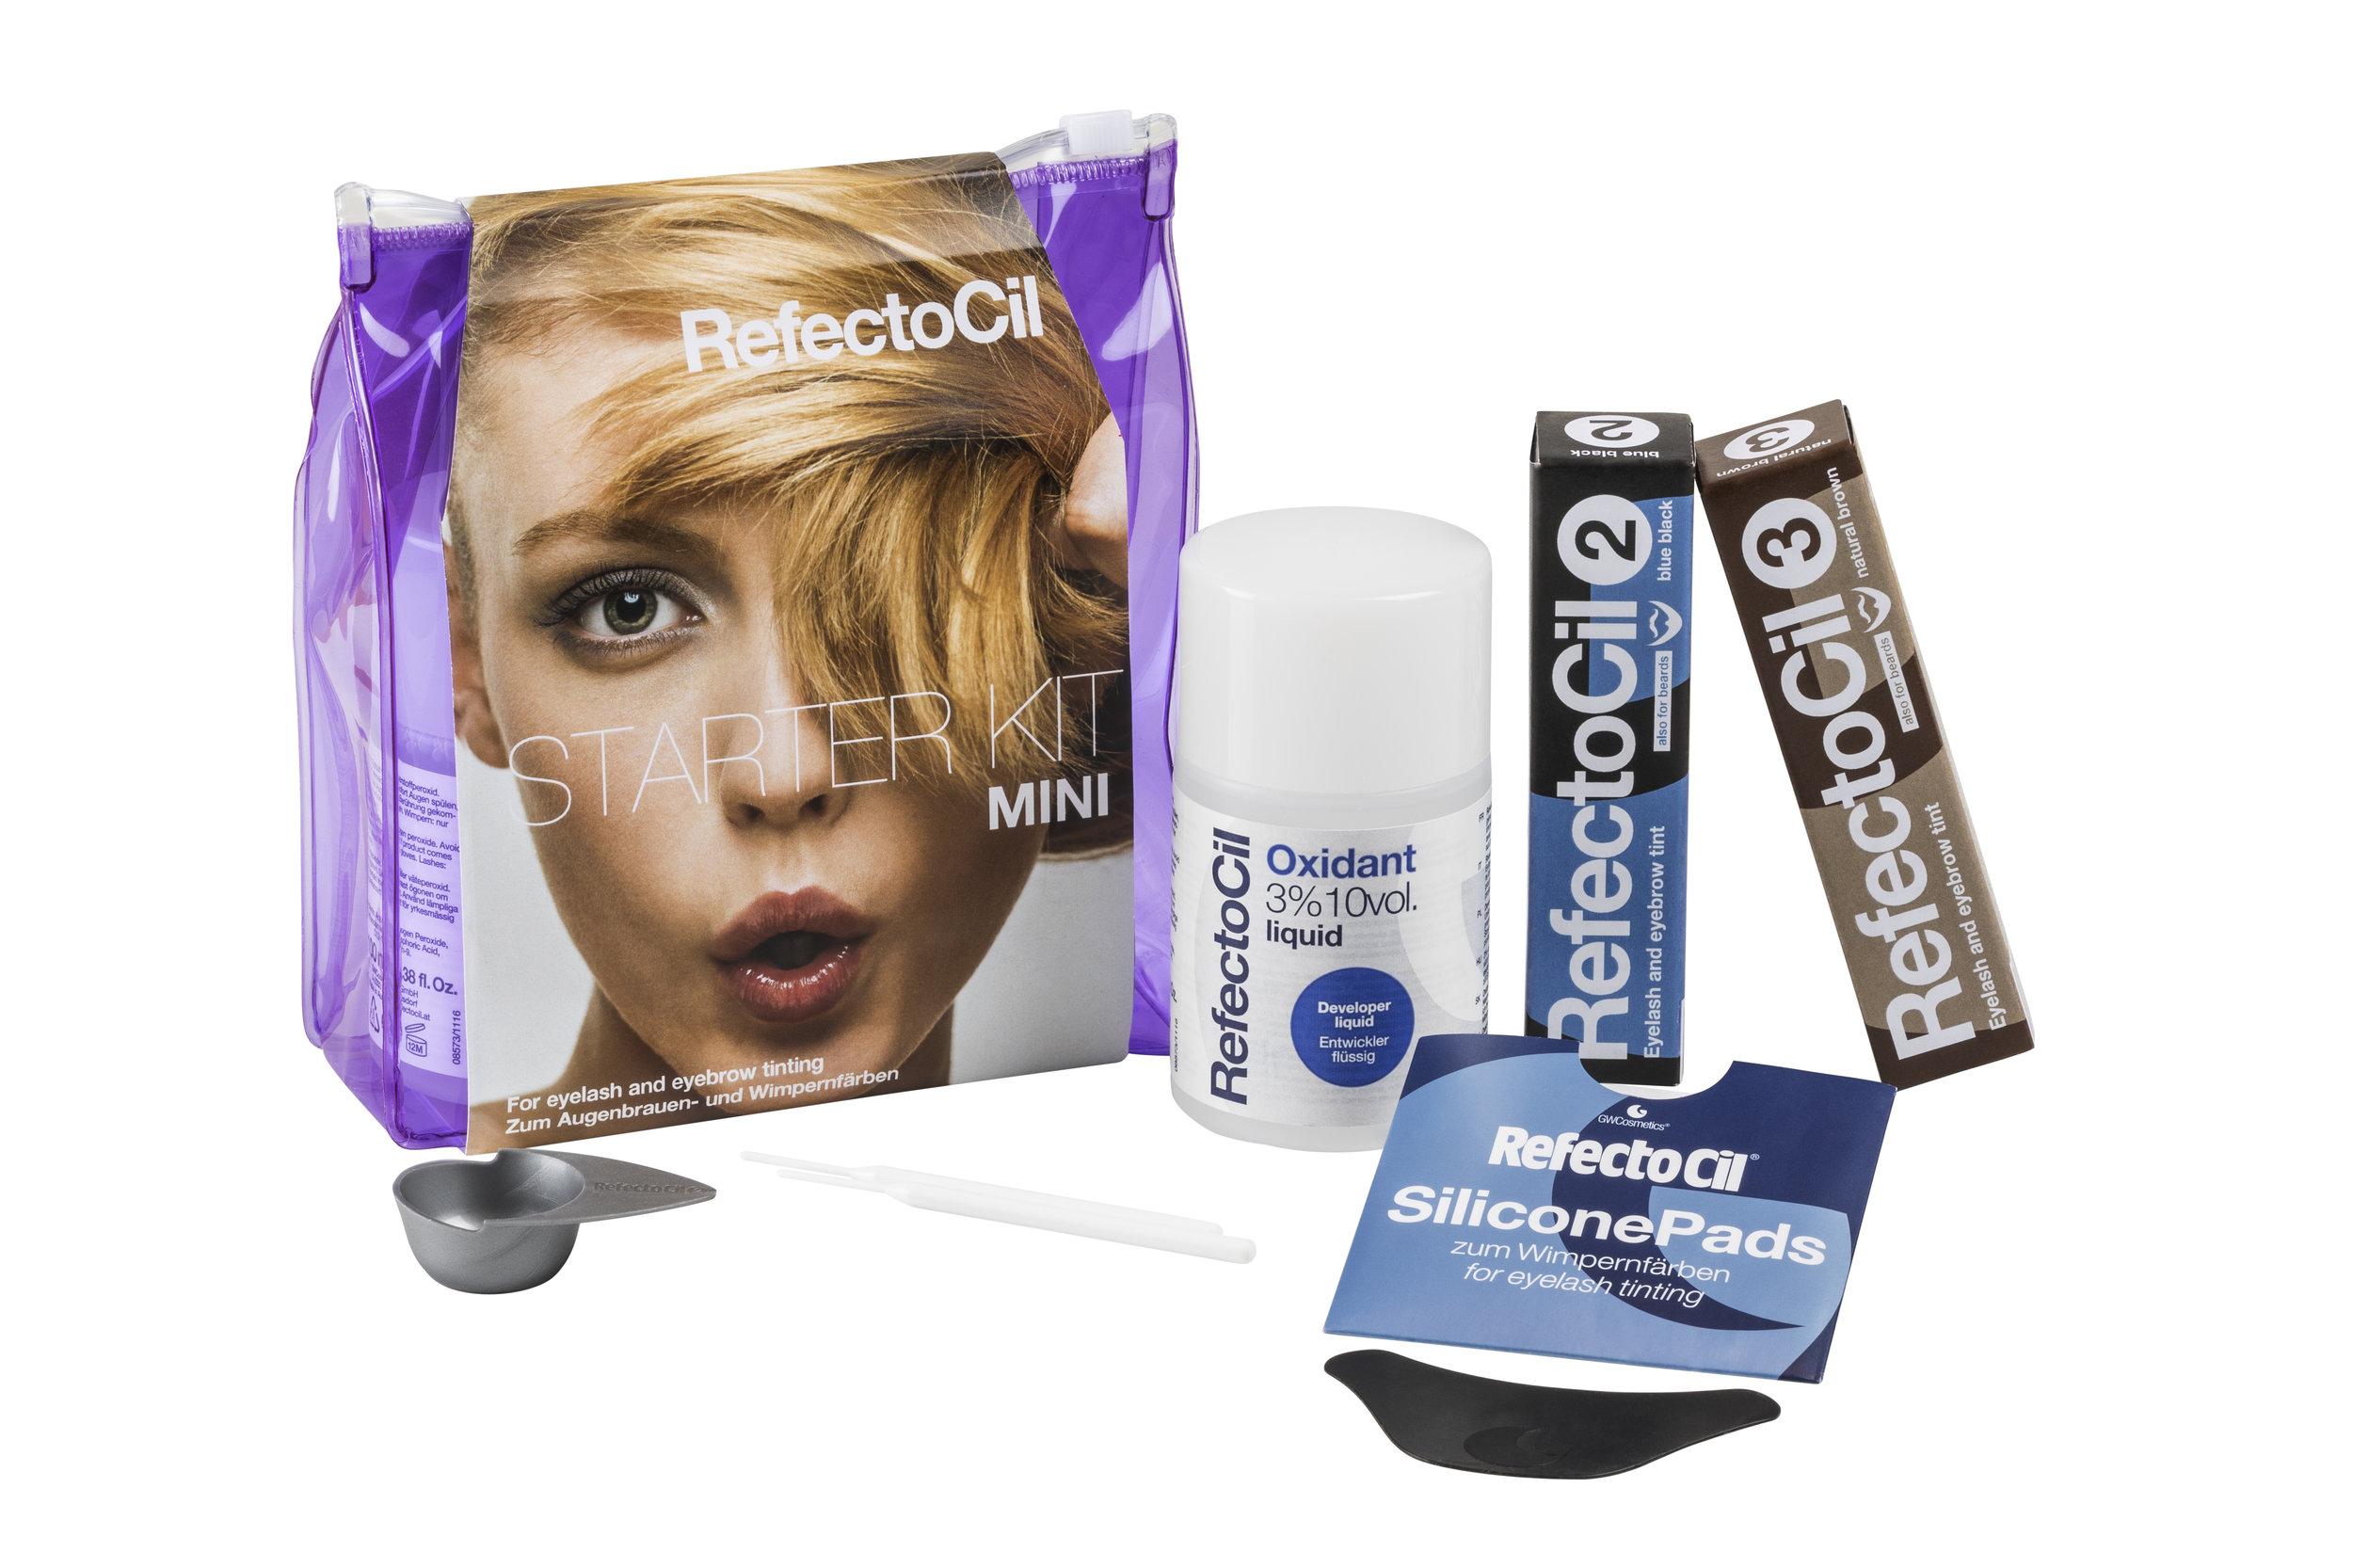 RefectoCil Starter Kit - Mini